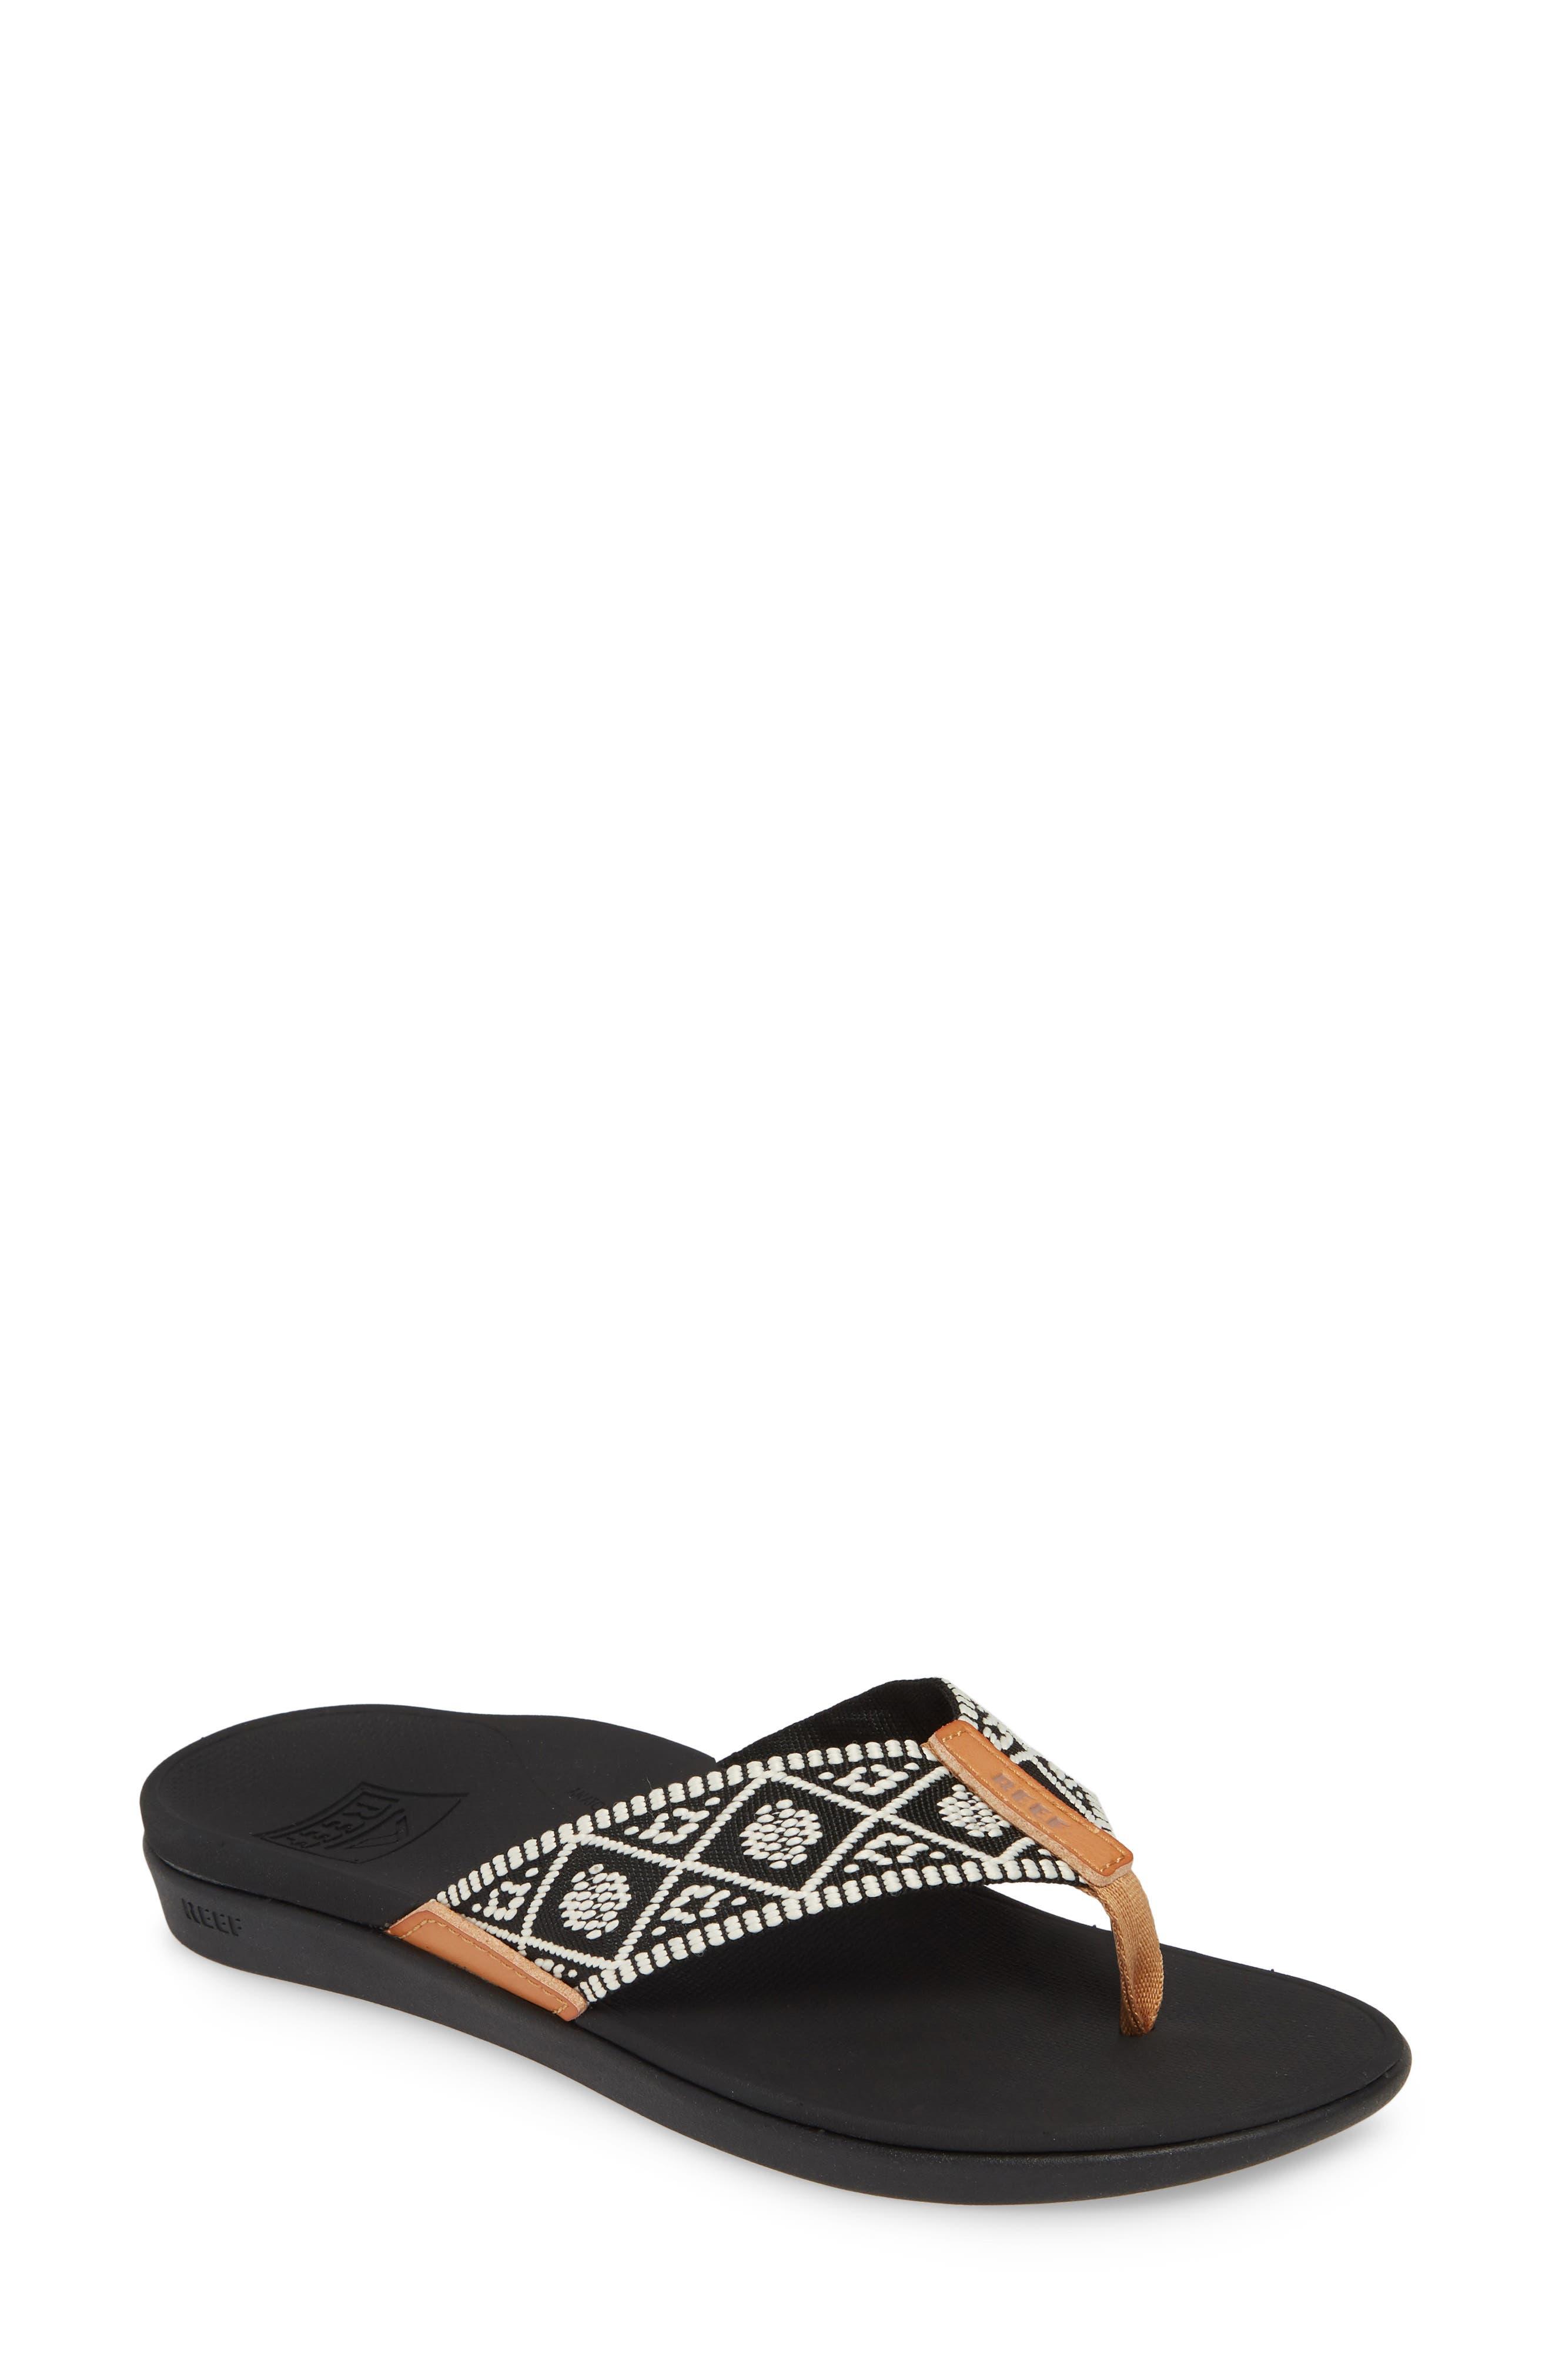 REEF, Ortho-Bounce Woven Flip Flop, Main thumbnail 1, color, BLACK/ WHITE